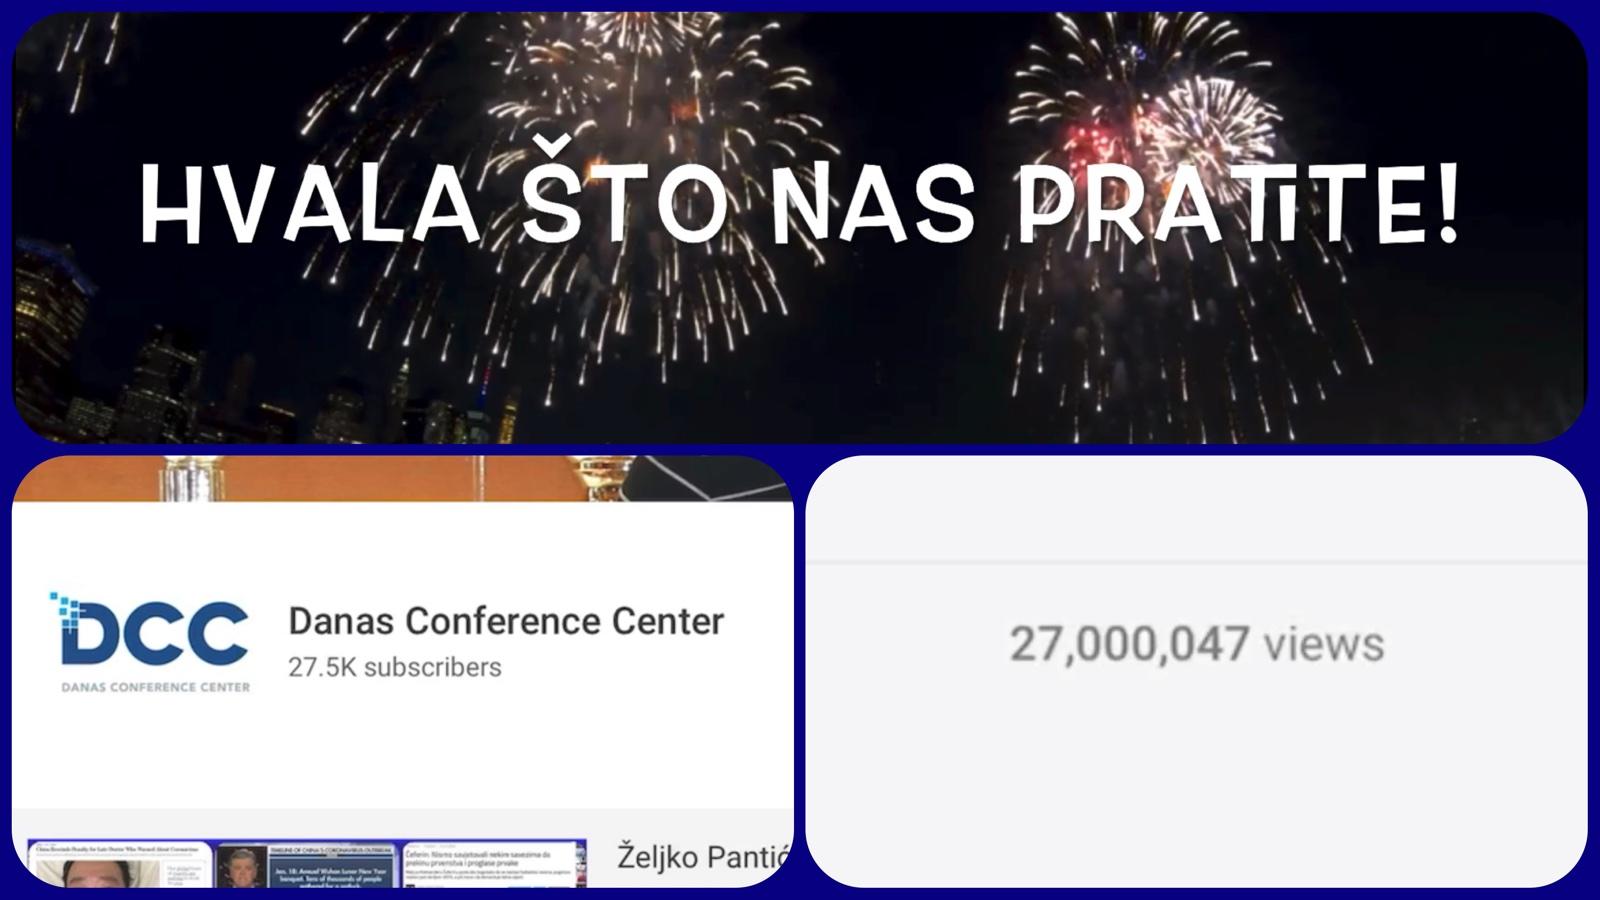 27 miliona pregleda na YouTube kanalu Danas Conference Center! (VIDEO)